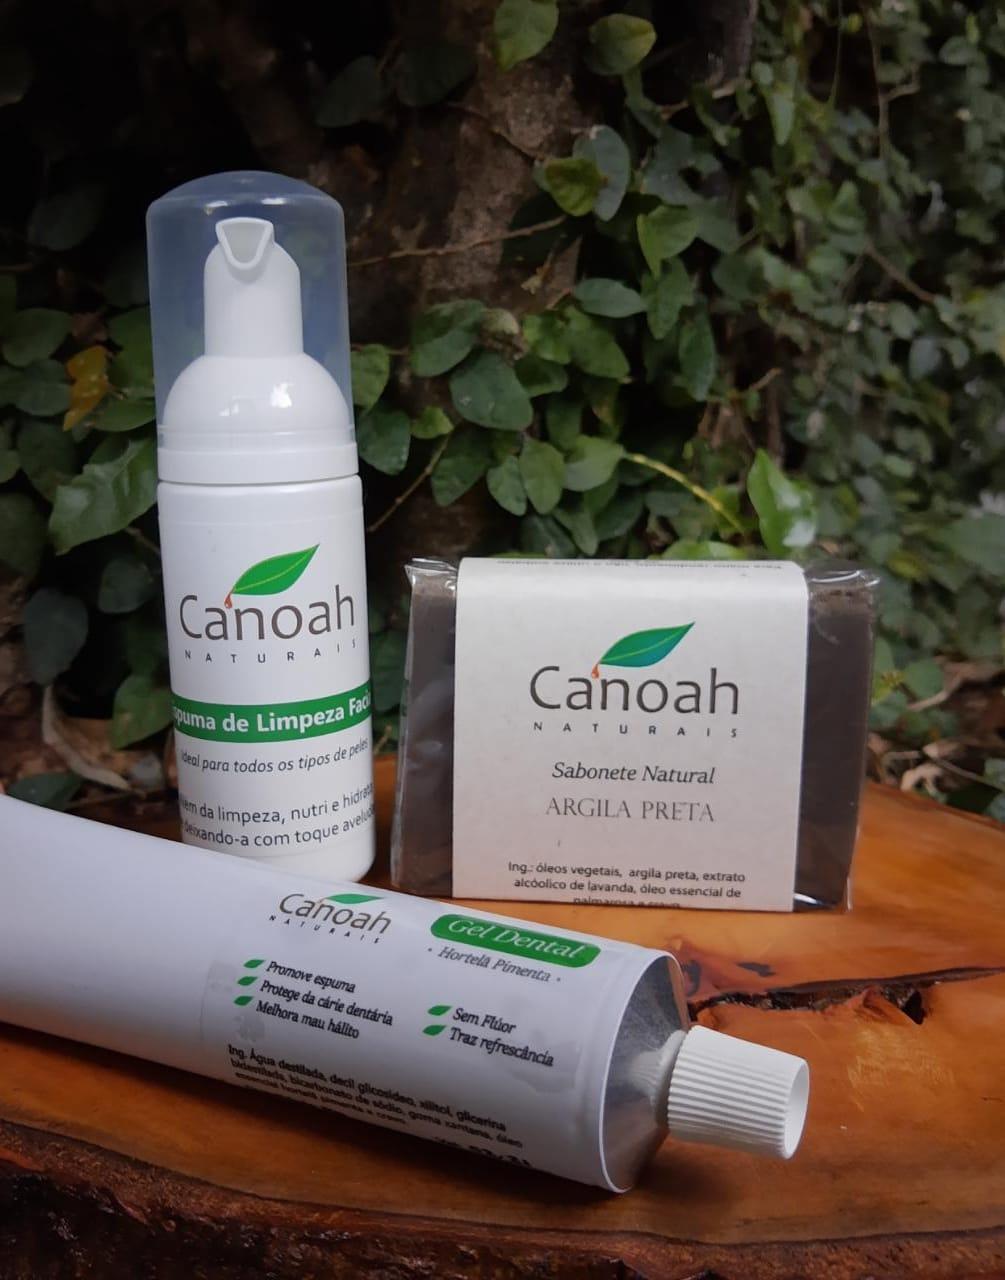 Kit Higiene Natural - Pele oleosa, mista e seca